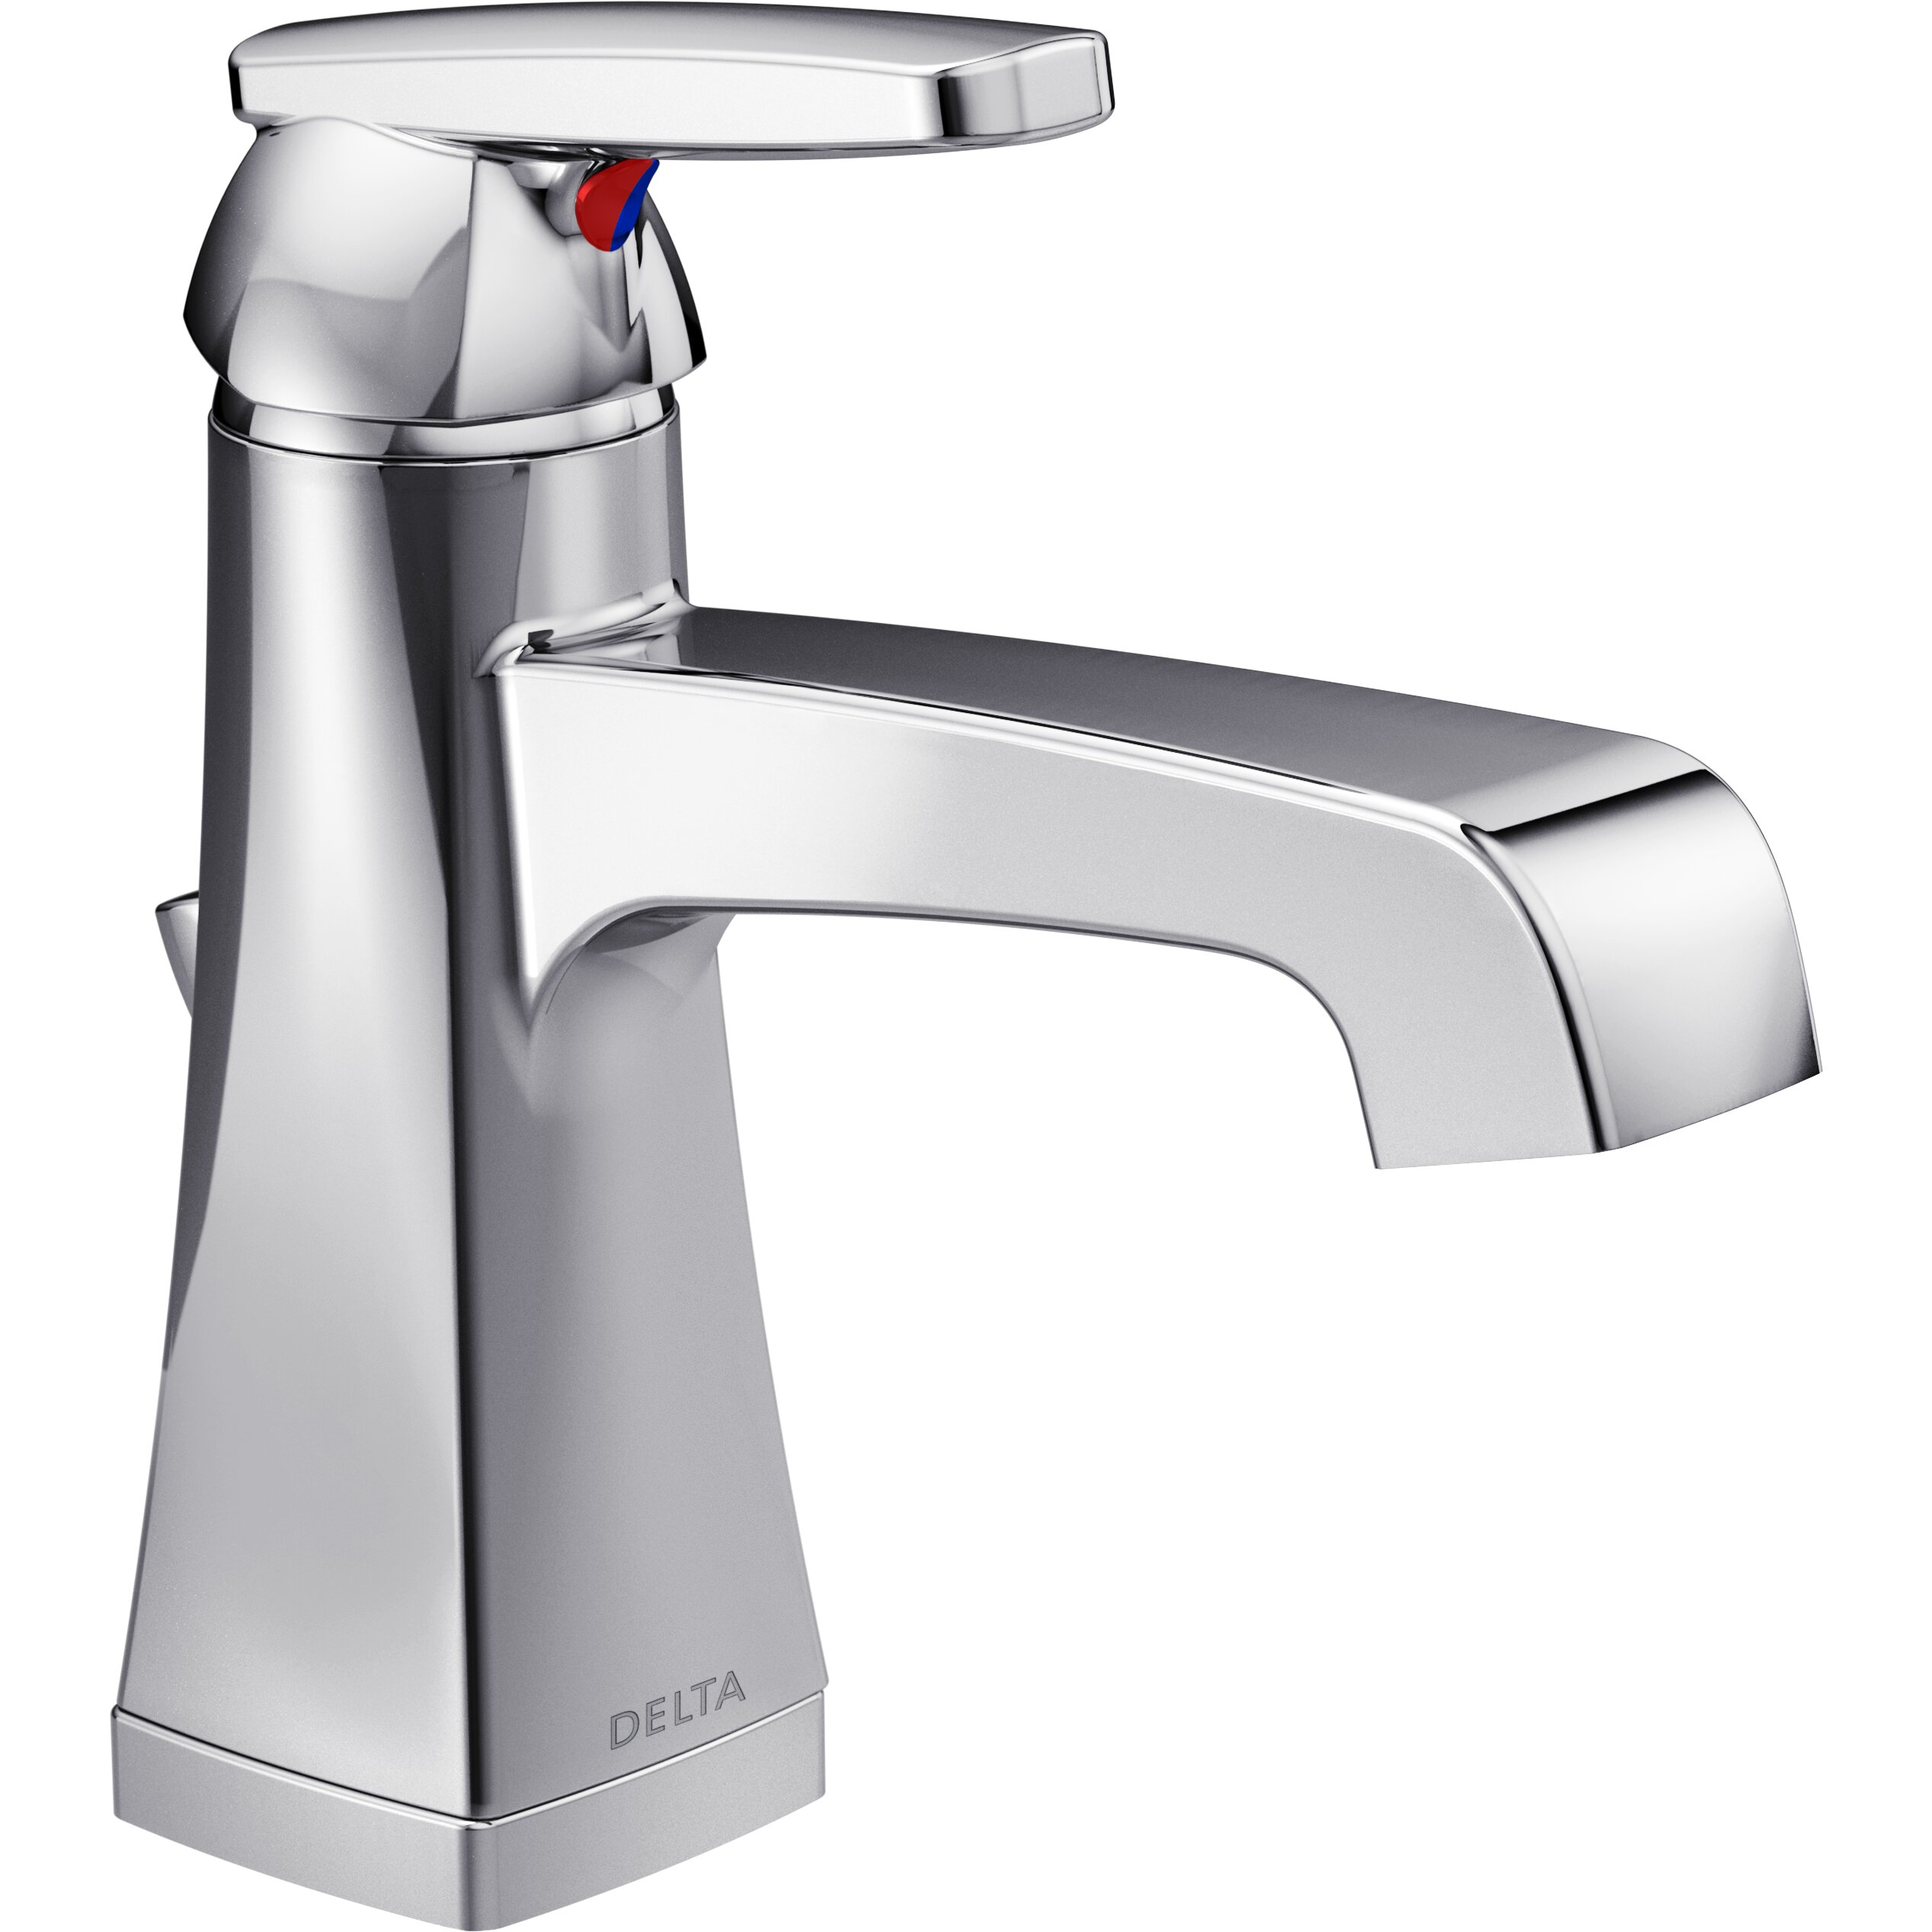 Delta Ashlyn Standard Bathroom Faucet Lever Handle With Drain Assembly Reviews Wayfair